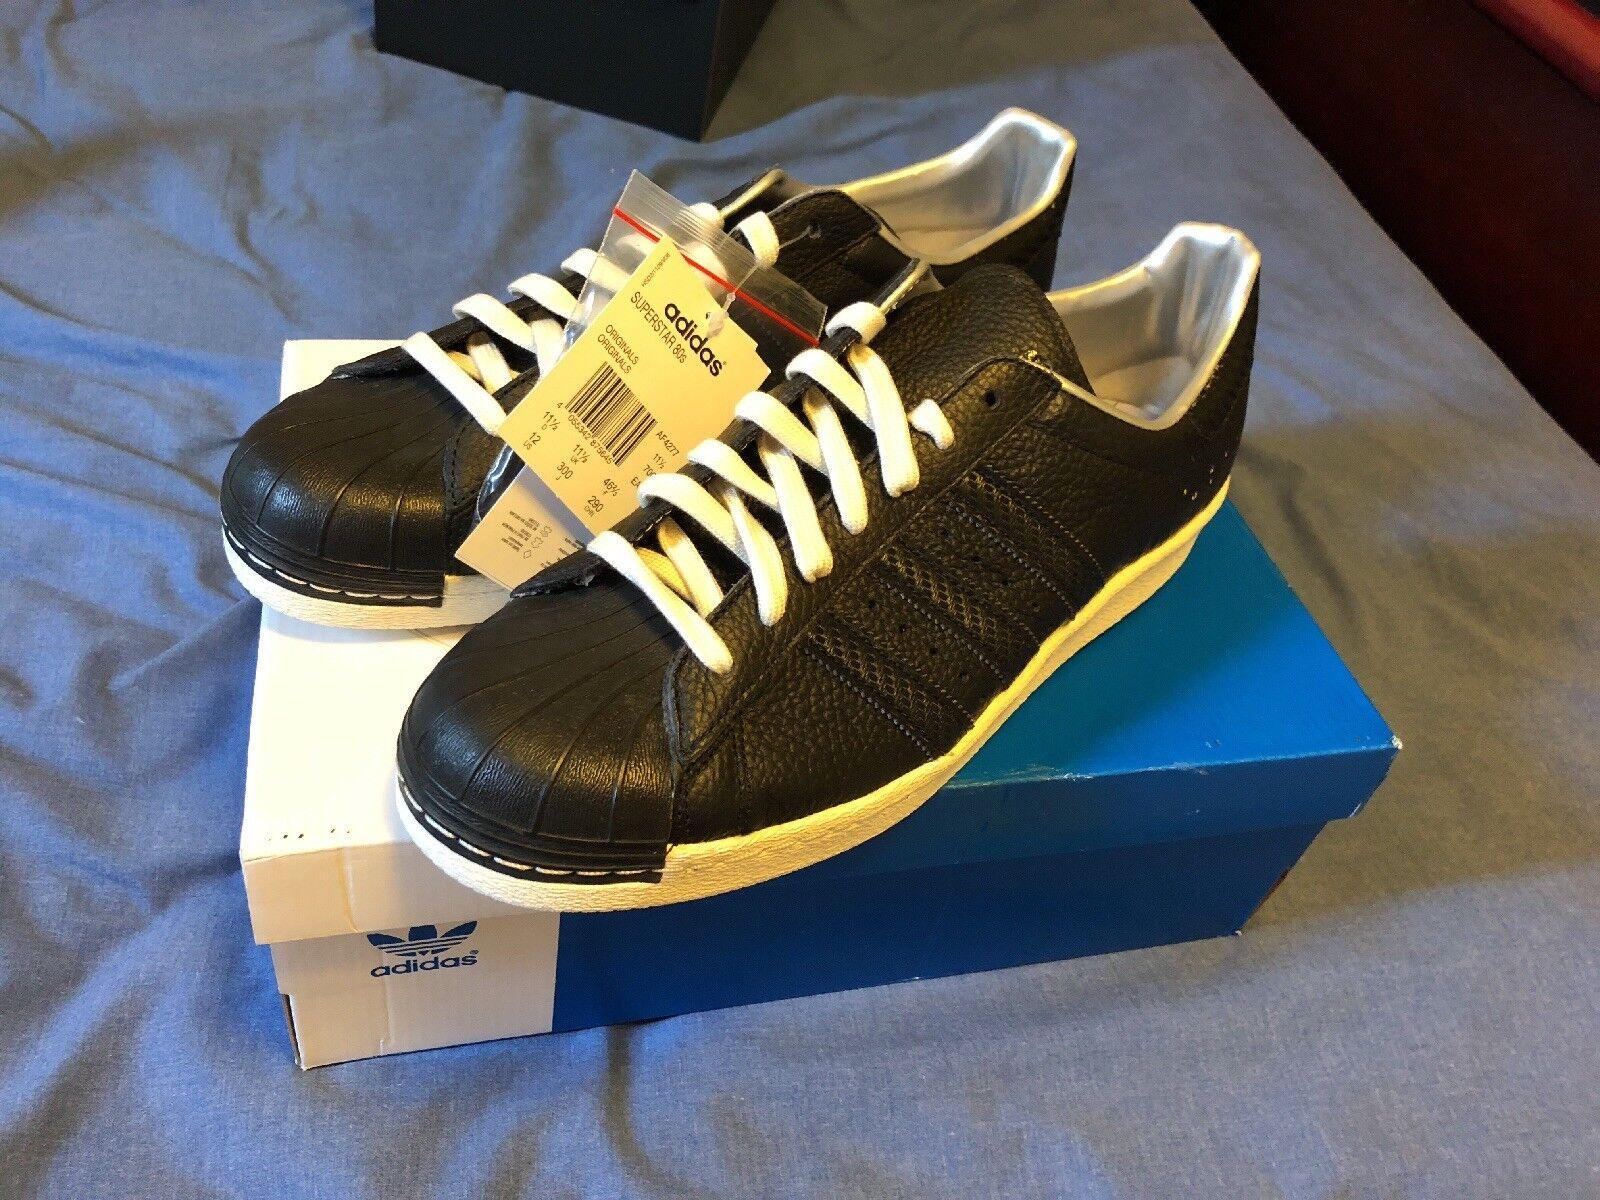 Adidas X Sneaksnsstuff Superstar 80s Camera Edition Sz 12 Limited